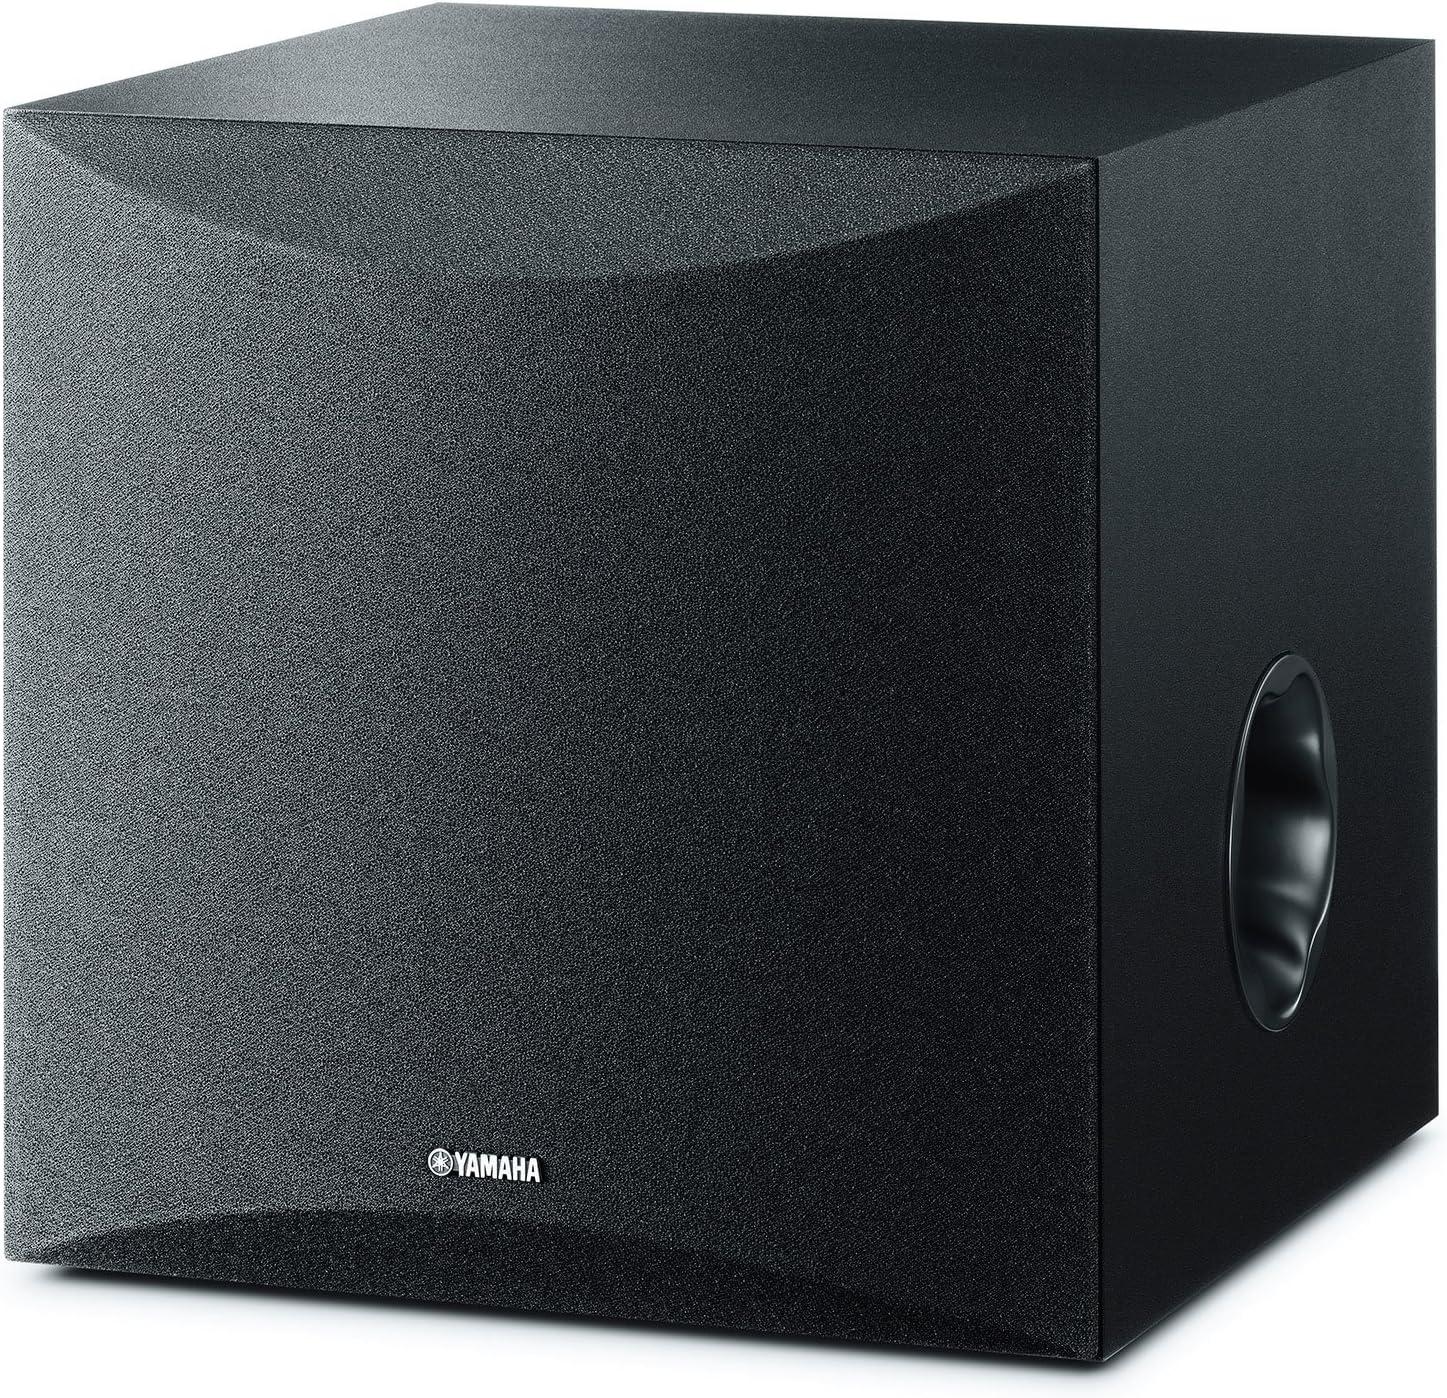 Yamaha NS-SW50 - Altavoz subwoofer Amplificado (28-200 Hz) Color Negro